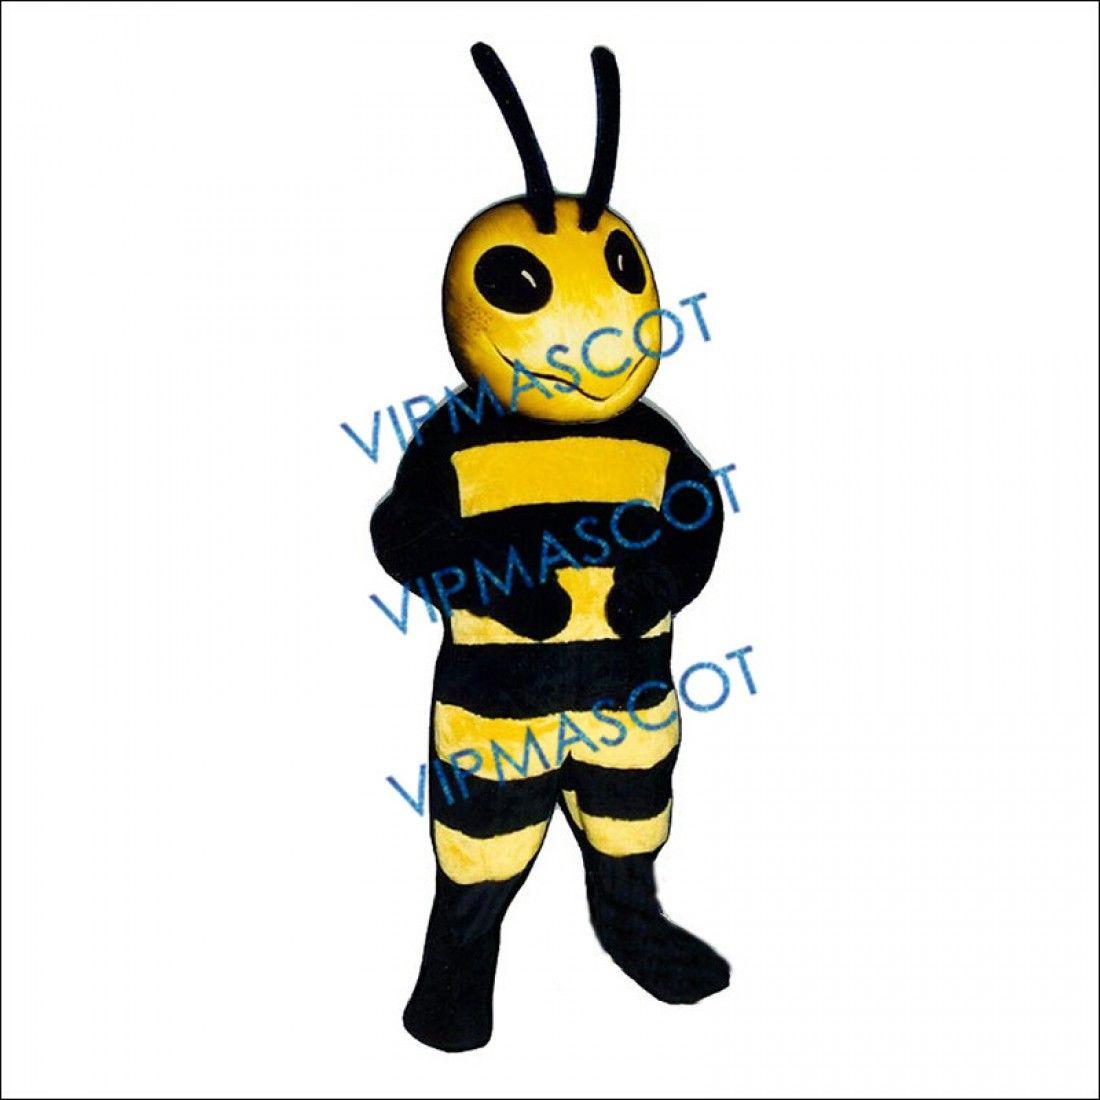 Drone bee mascot costume in 2020 mascot costumes